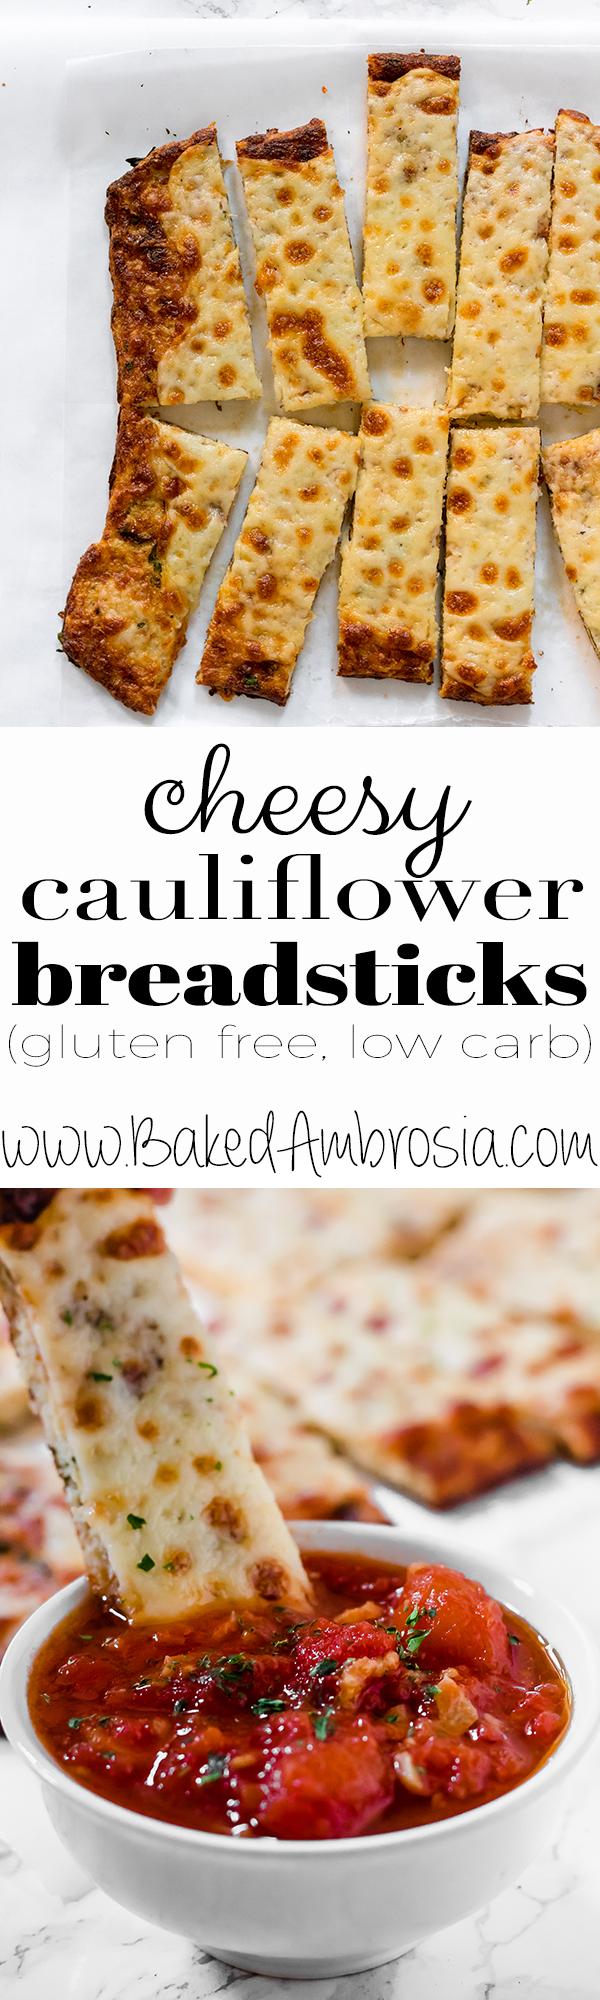 Low Carb Cheesy Cauliflower Breadsticks (gluten free